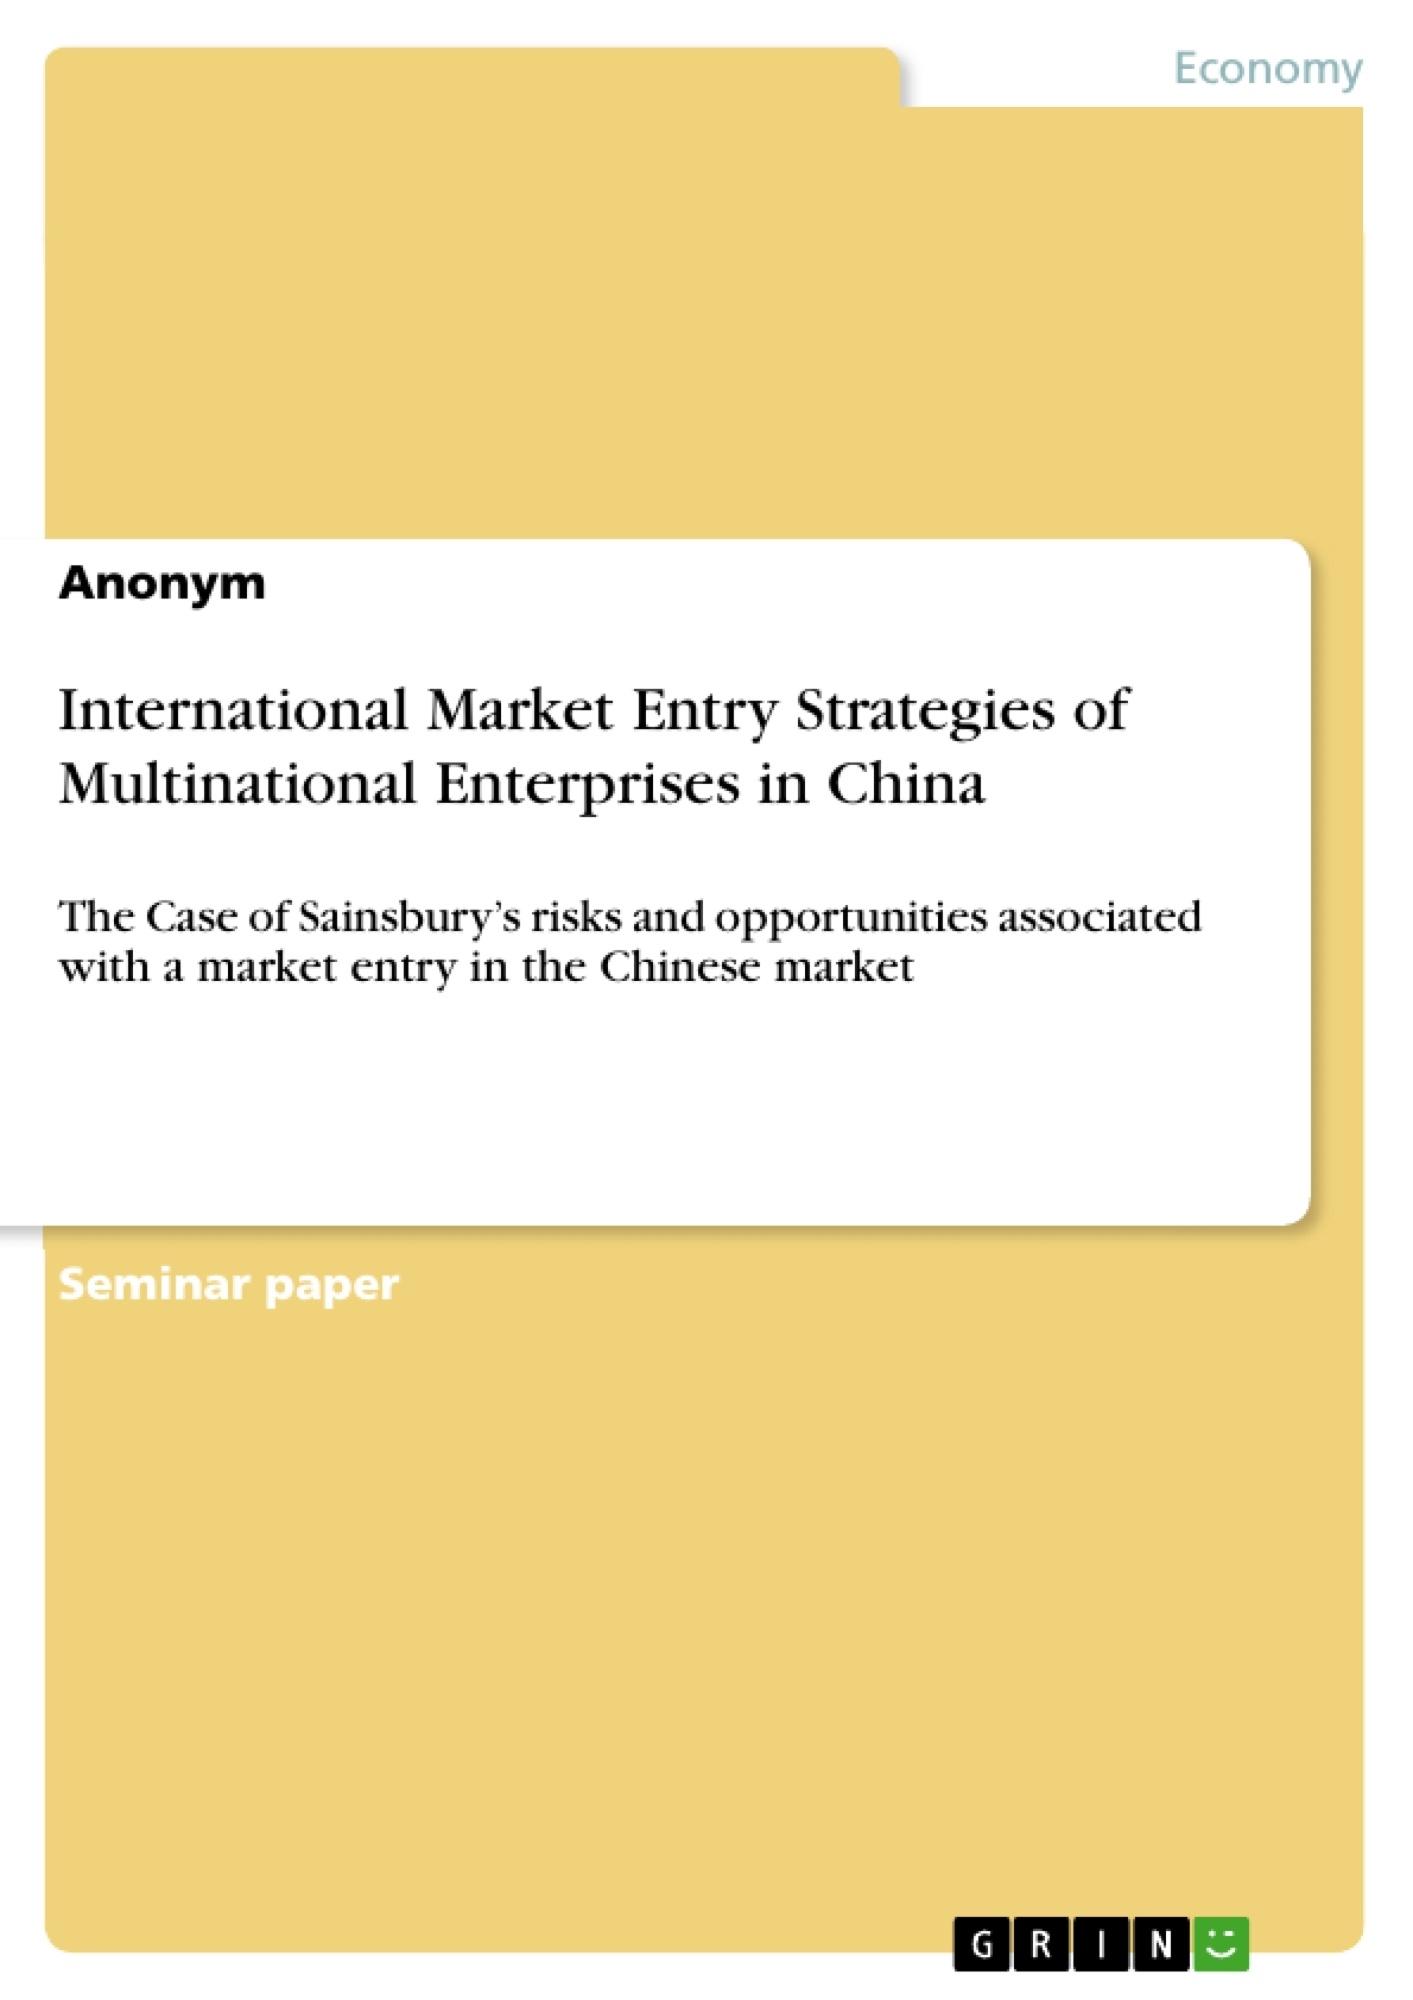 Title: International Market Entry Strategies of Multinational Enterprises in China